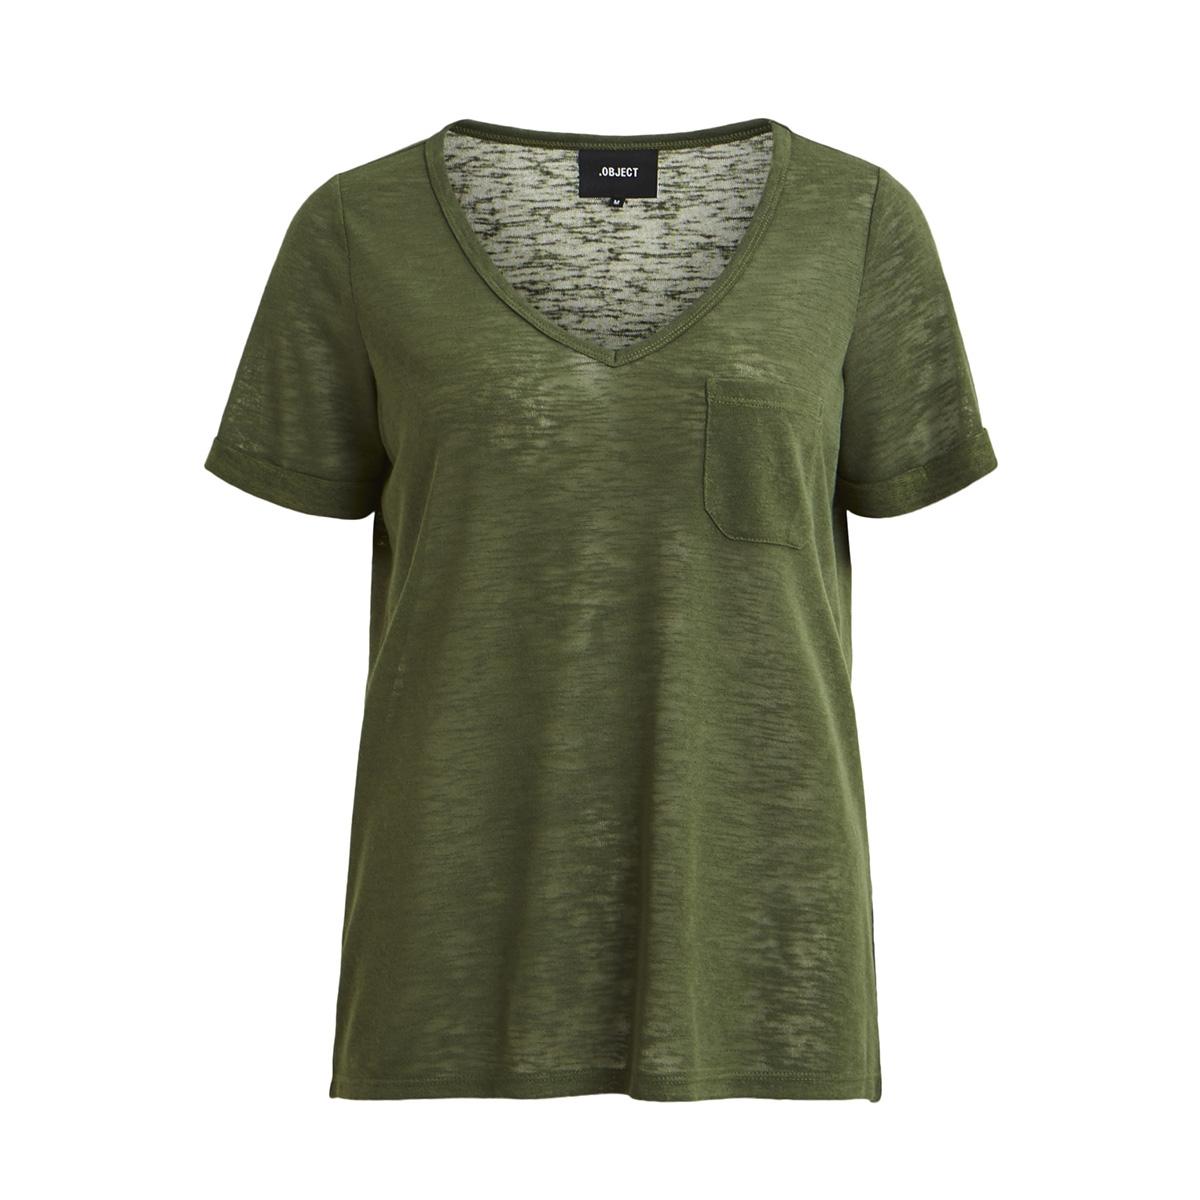 objtessi slub s/s v-neck seasonal 23026968 object t-shirt black forest